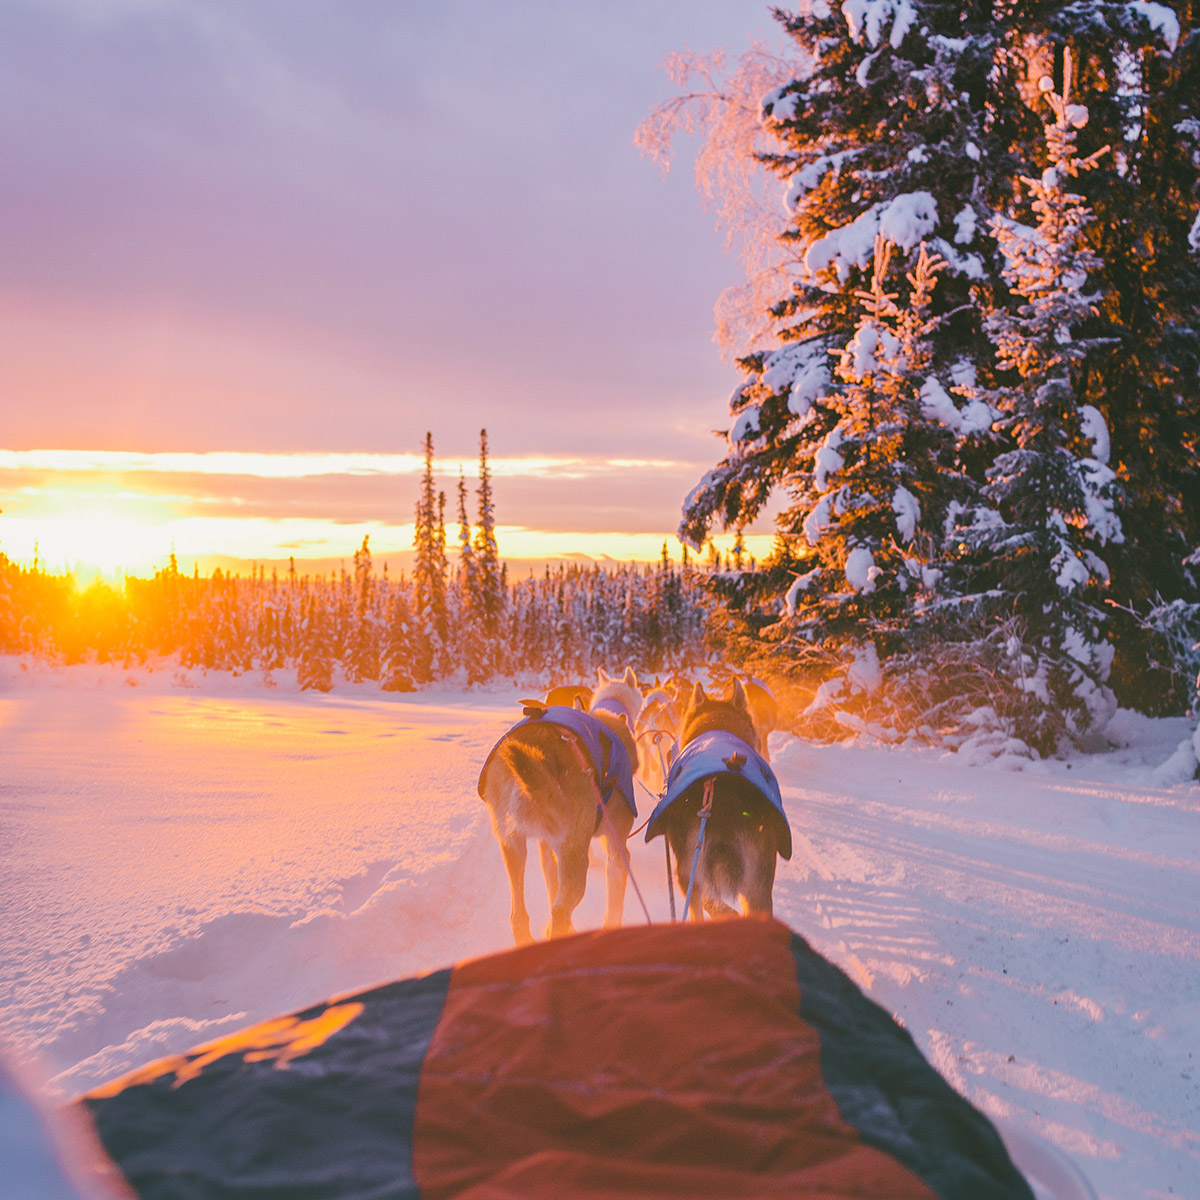 Bucket List Travel 2021 - Lapland